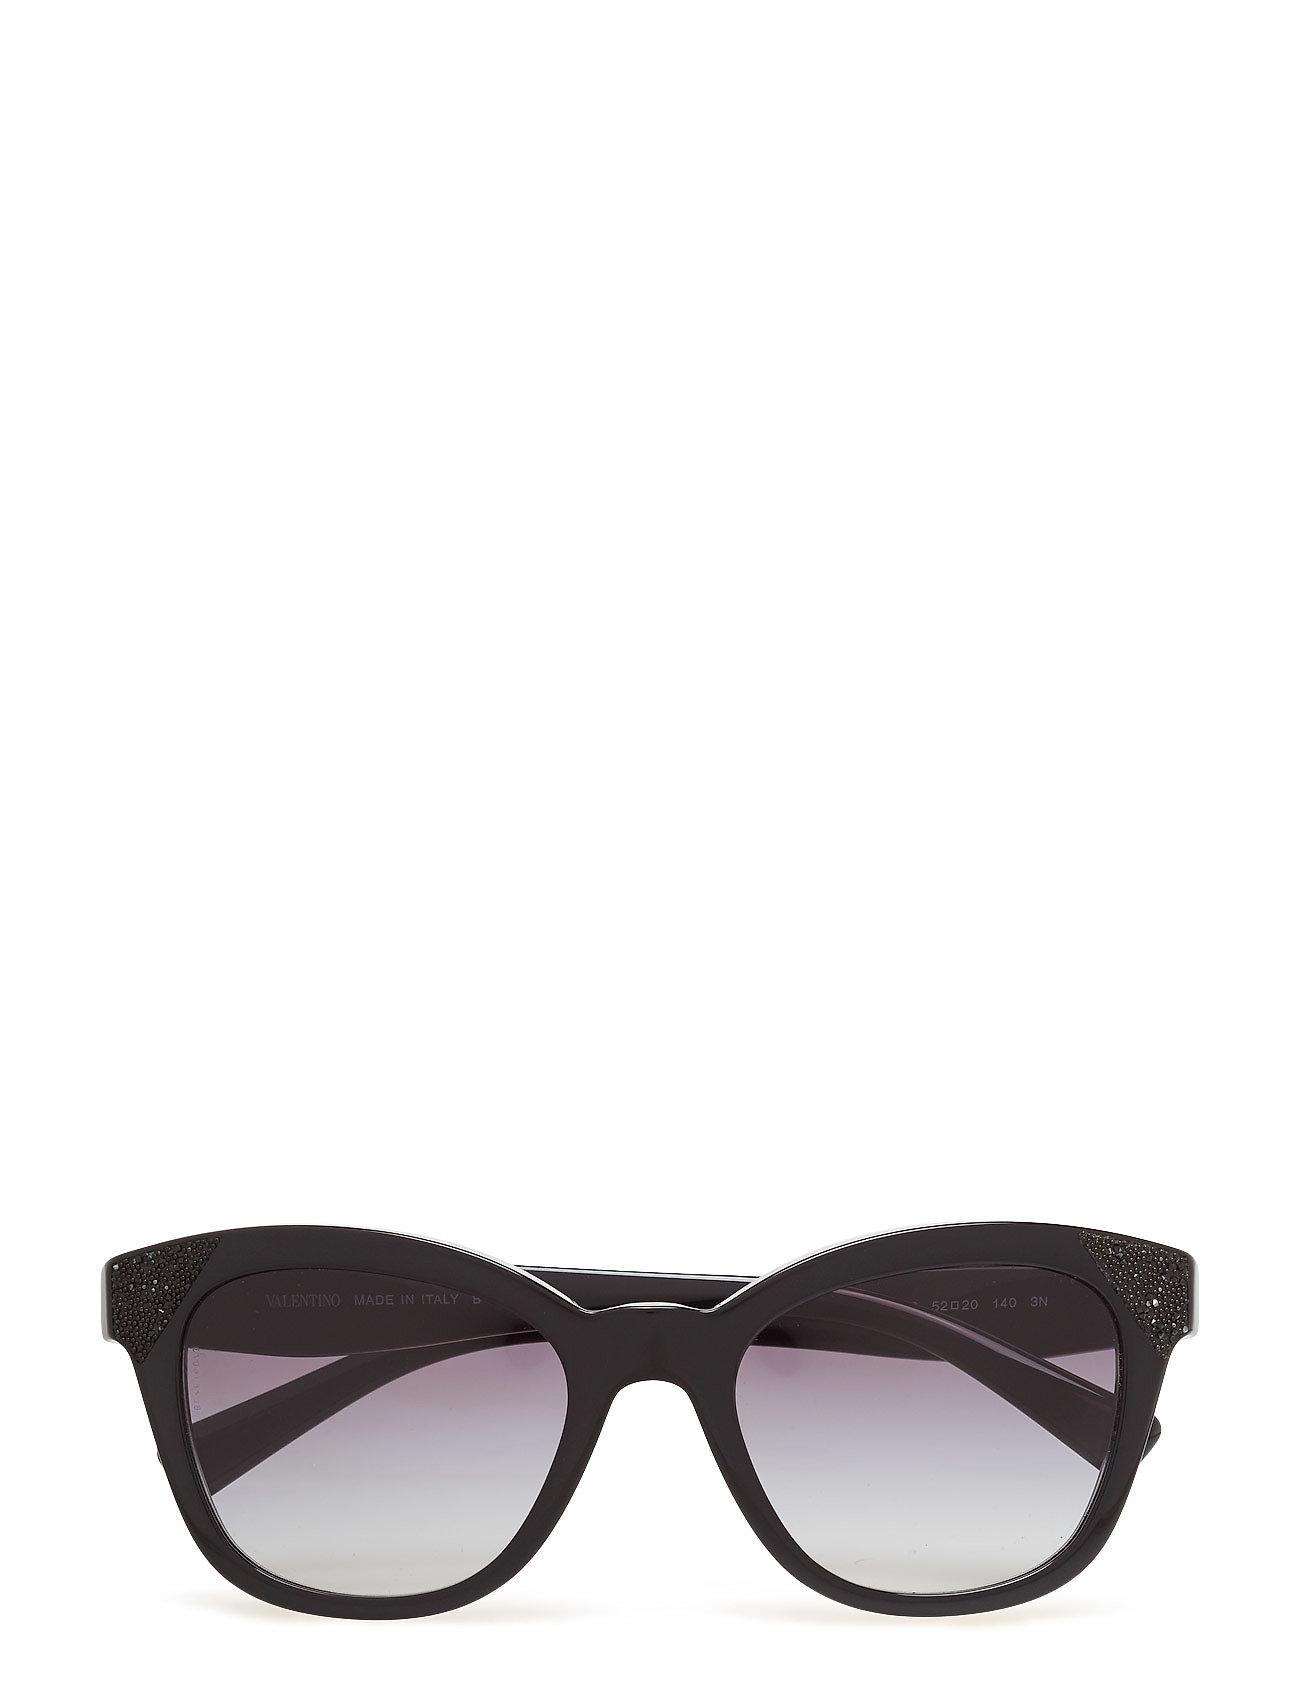 Rockstud - Valentino Sunglasses